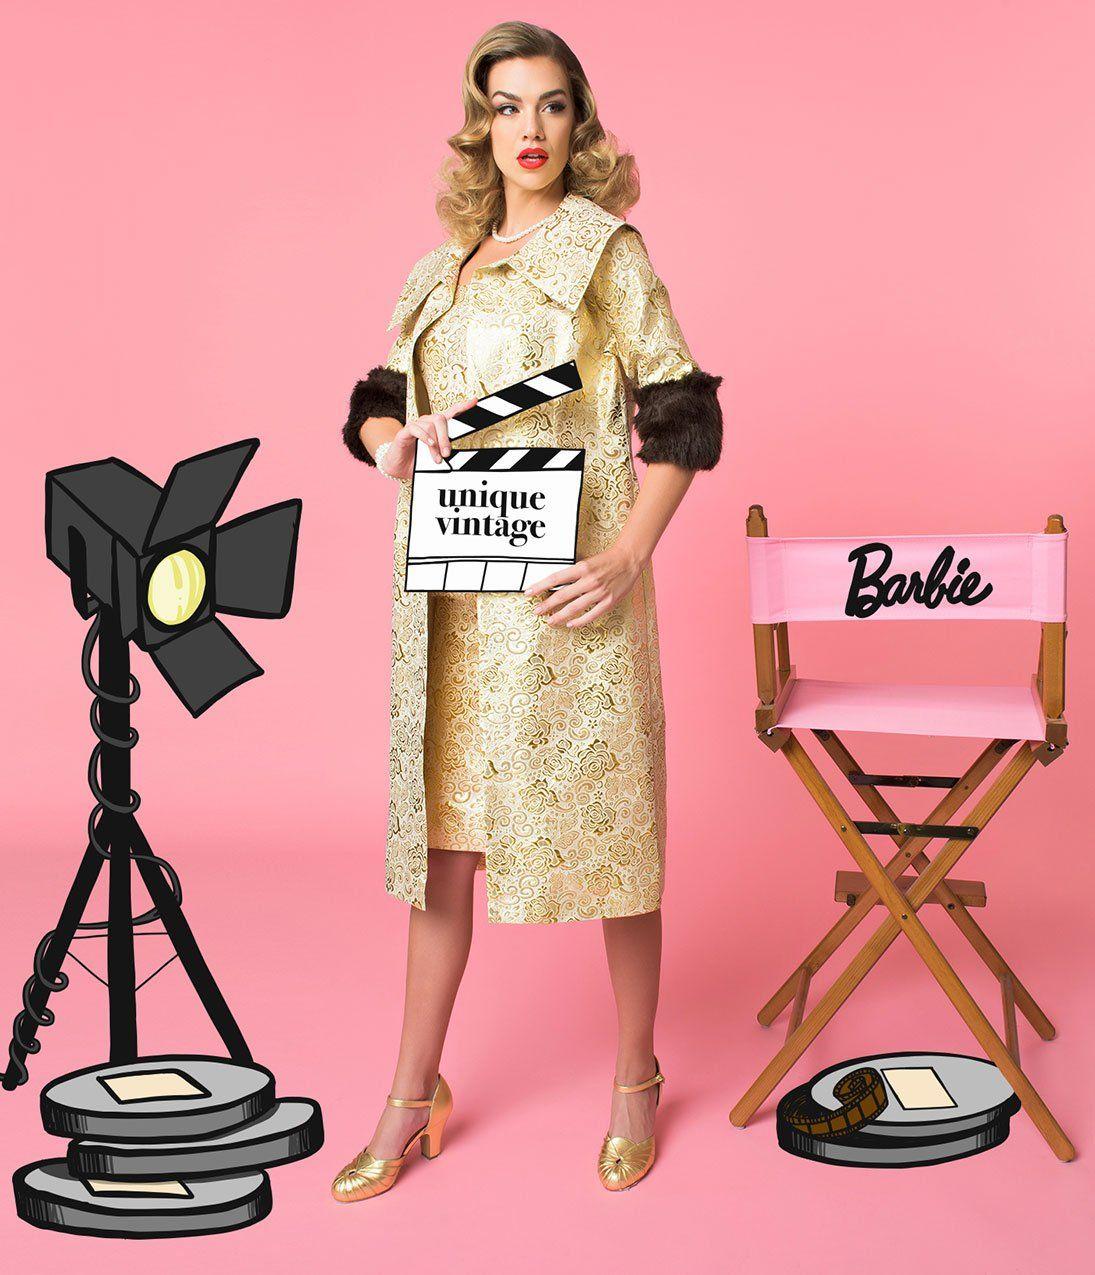 54e0793e4af Barbie x Unique Vintage Evening Splendour Brocade Coat in 2019 ...